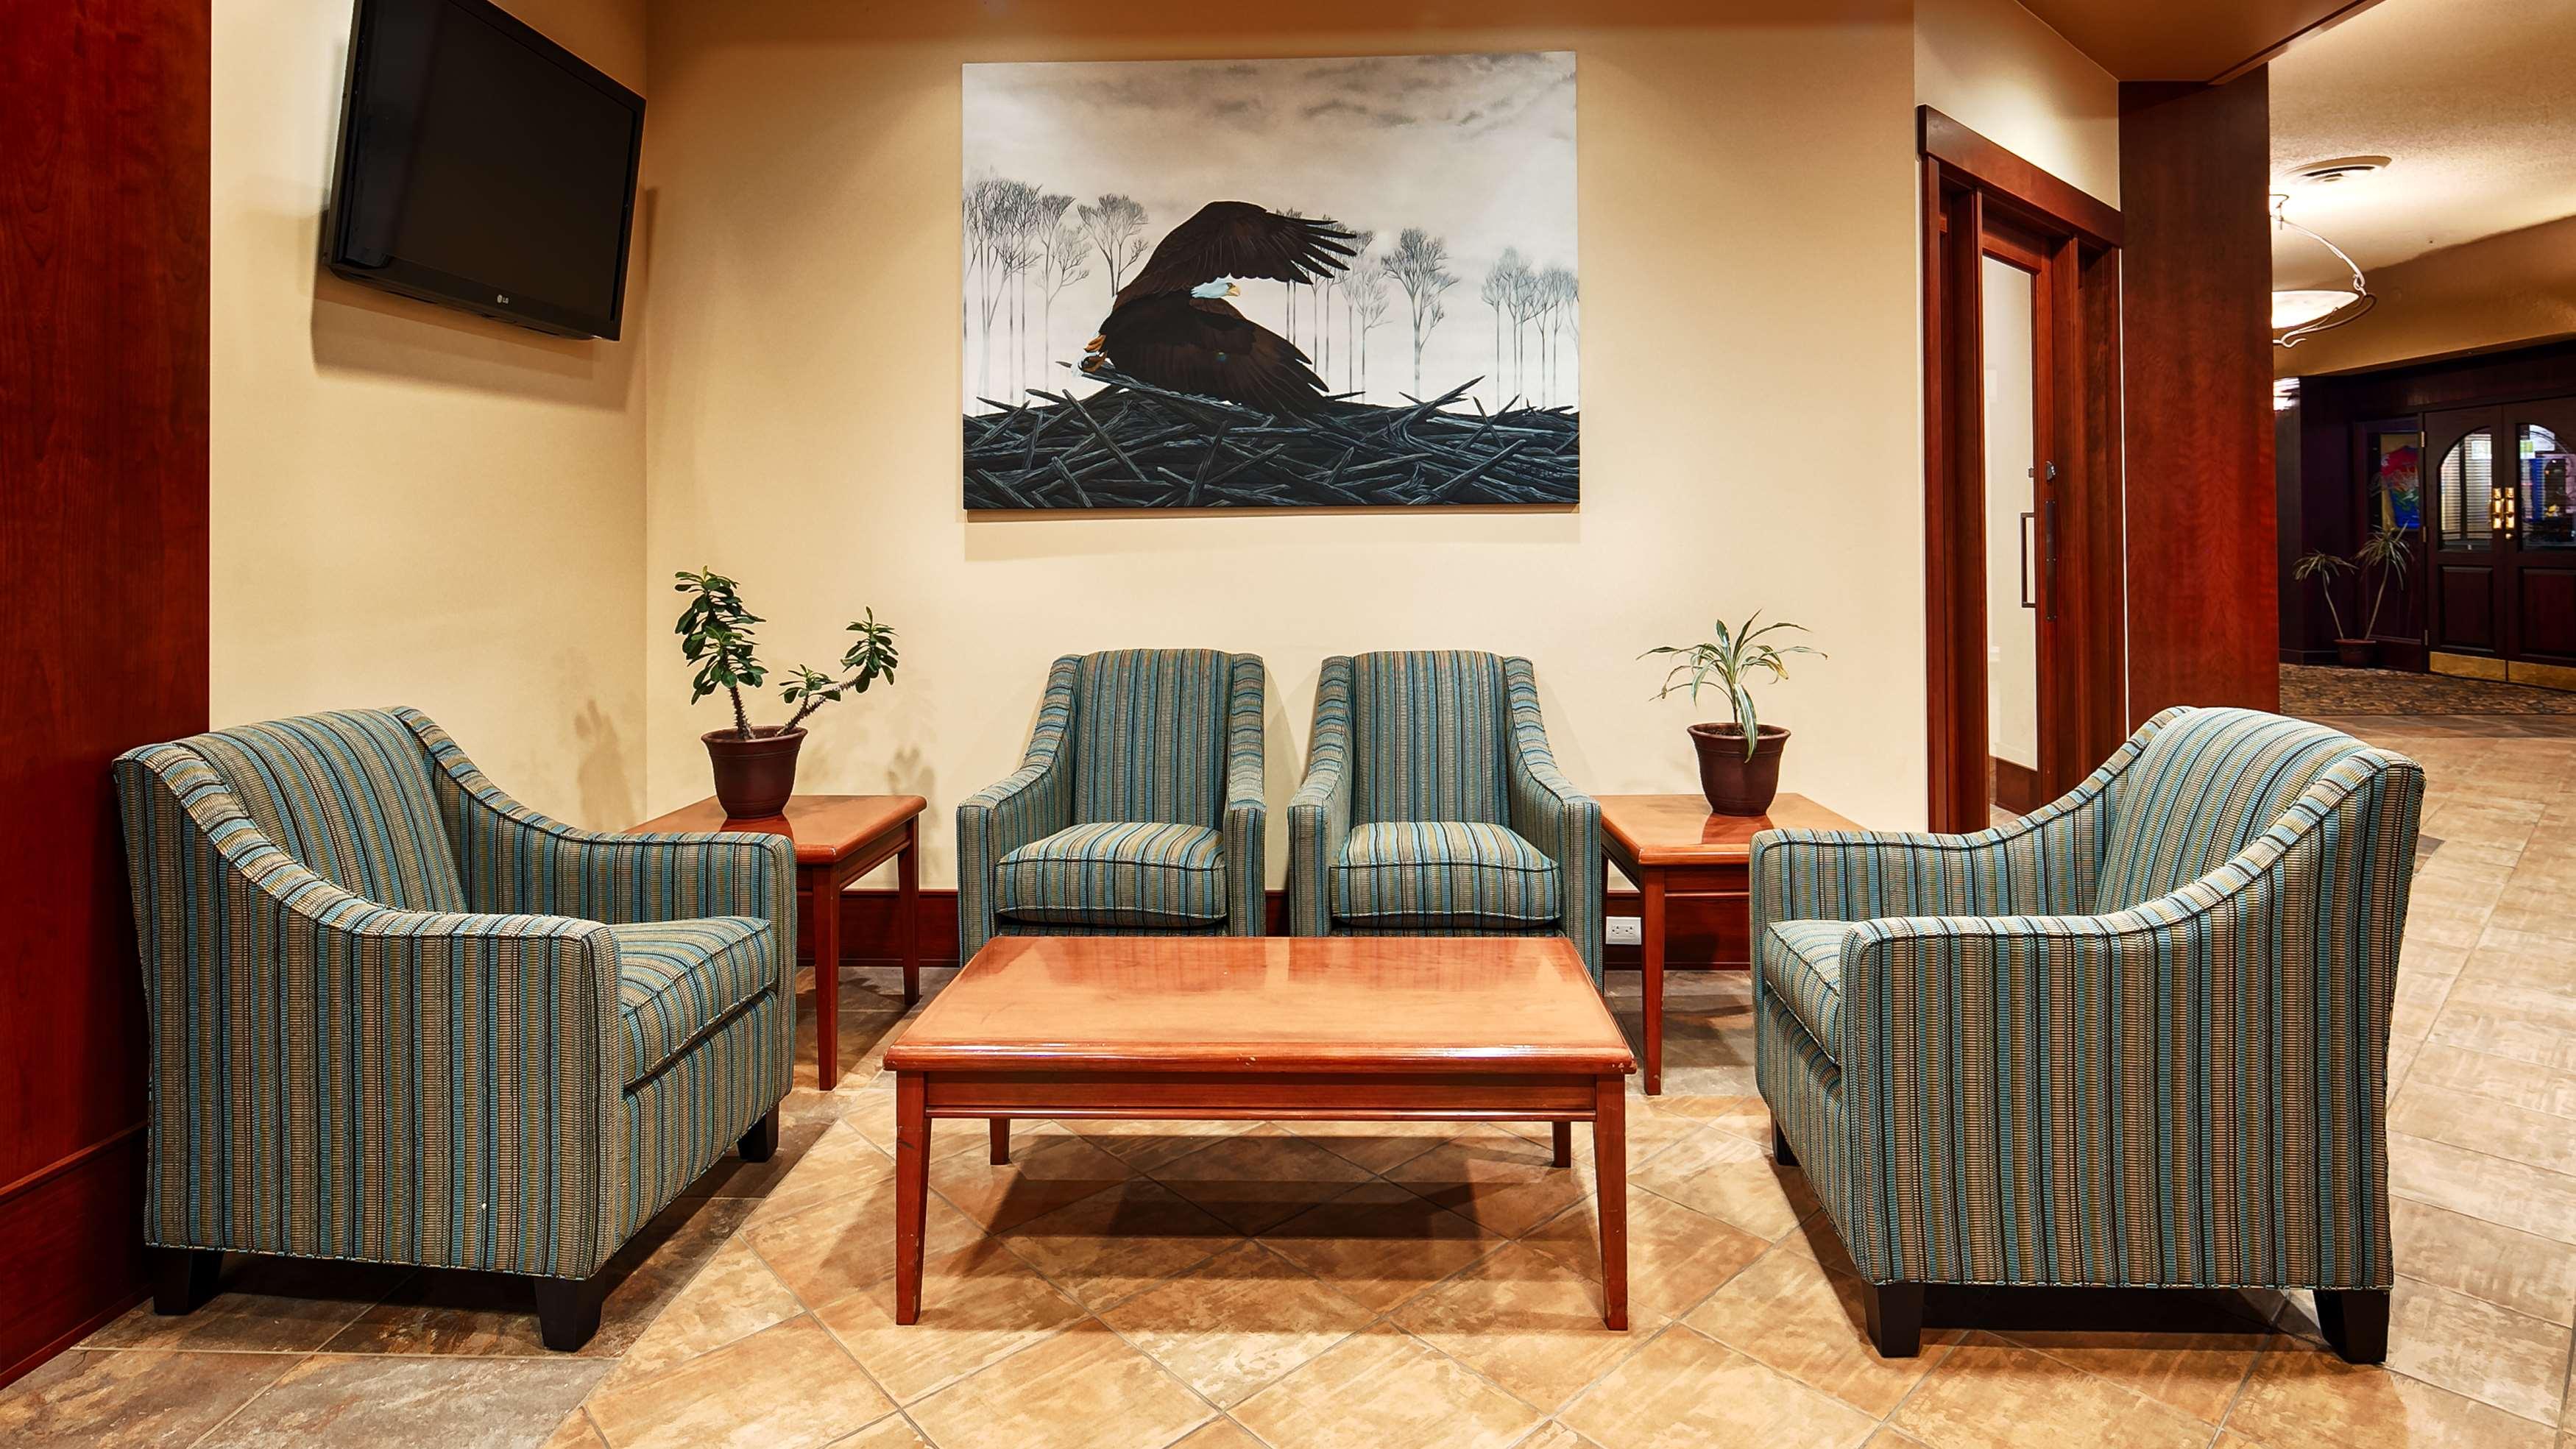 Best Western Plus Barclay Hotel in Port Alberni: Lobby